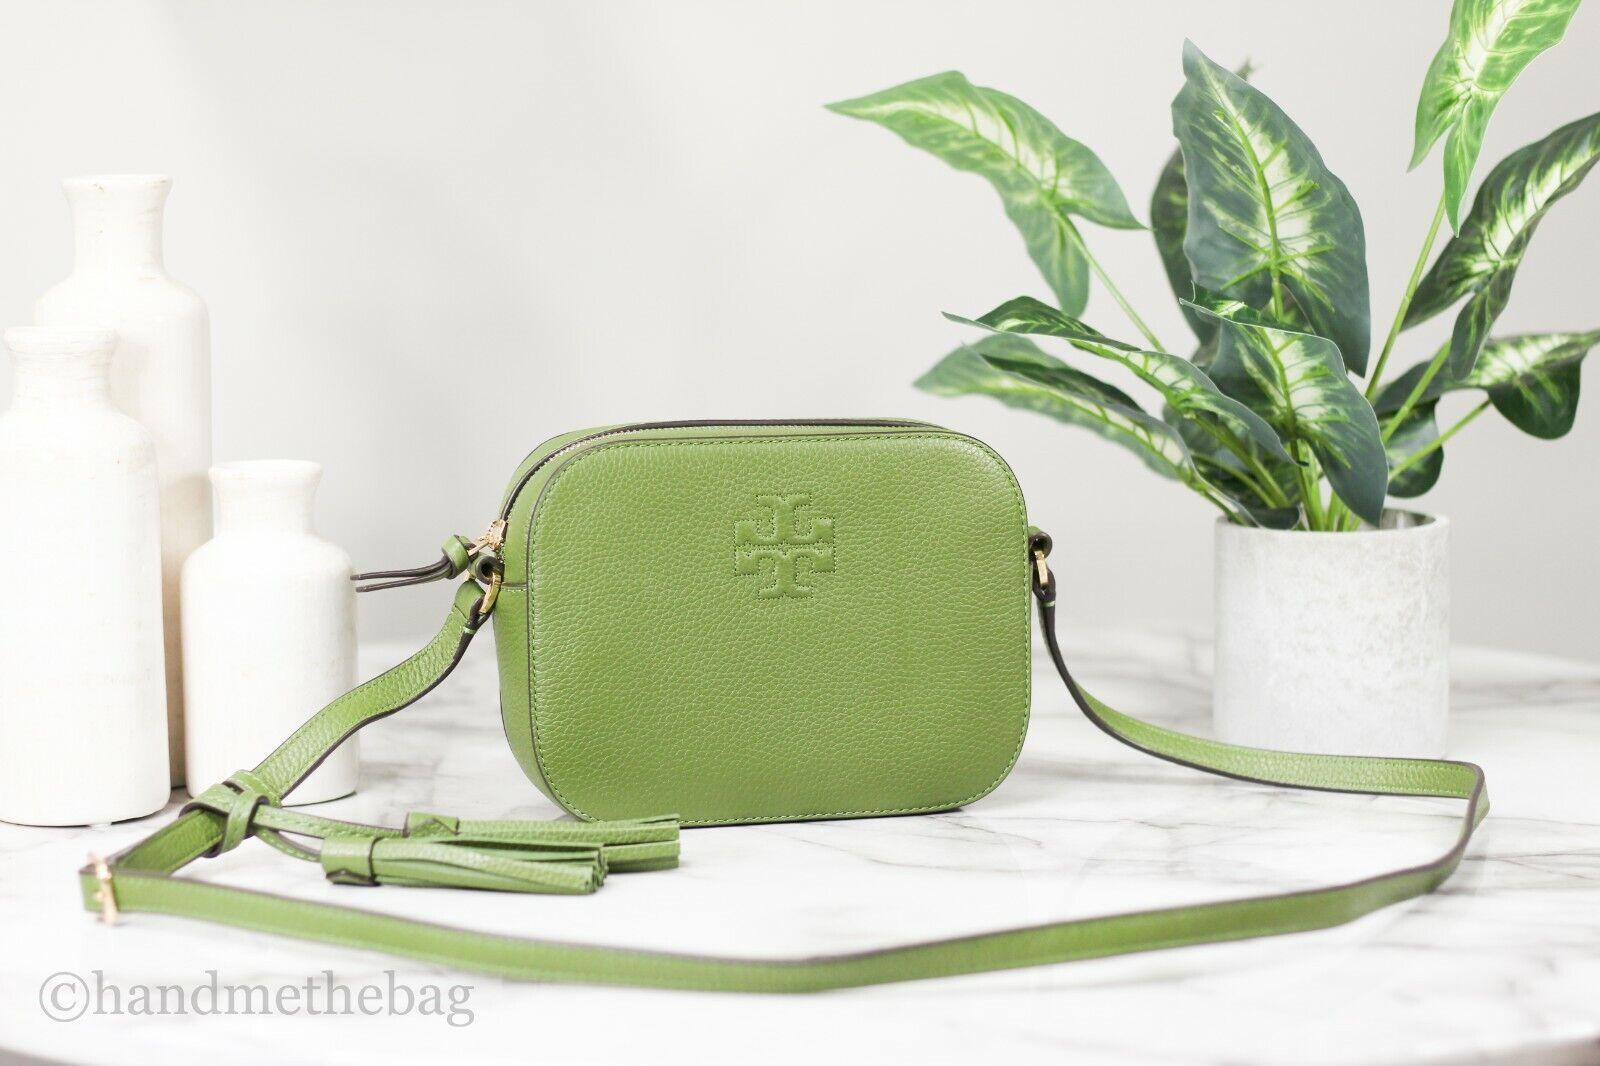 Tory Burch 67287 Thea Pebbled Leather Spinach Camera Crossbody Bag Handbag